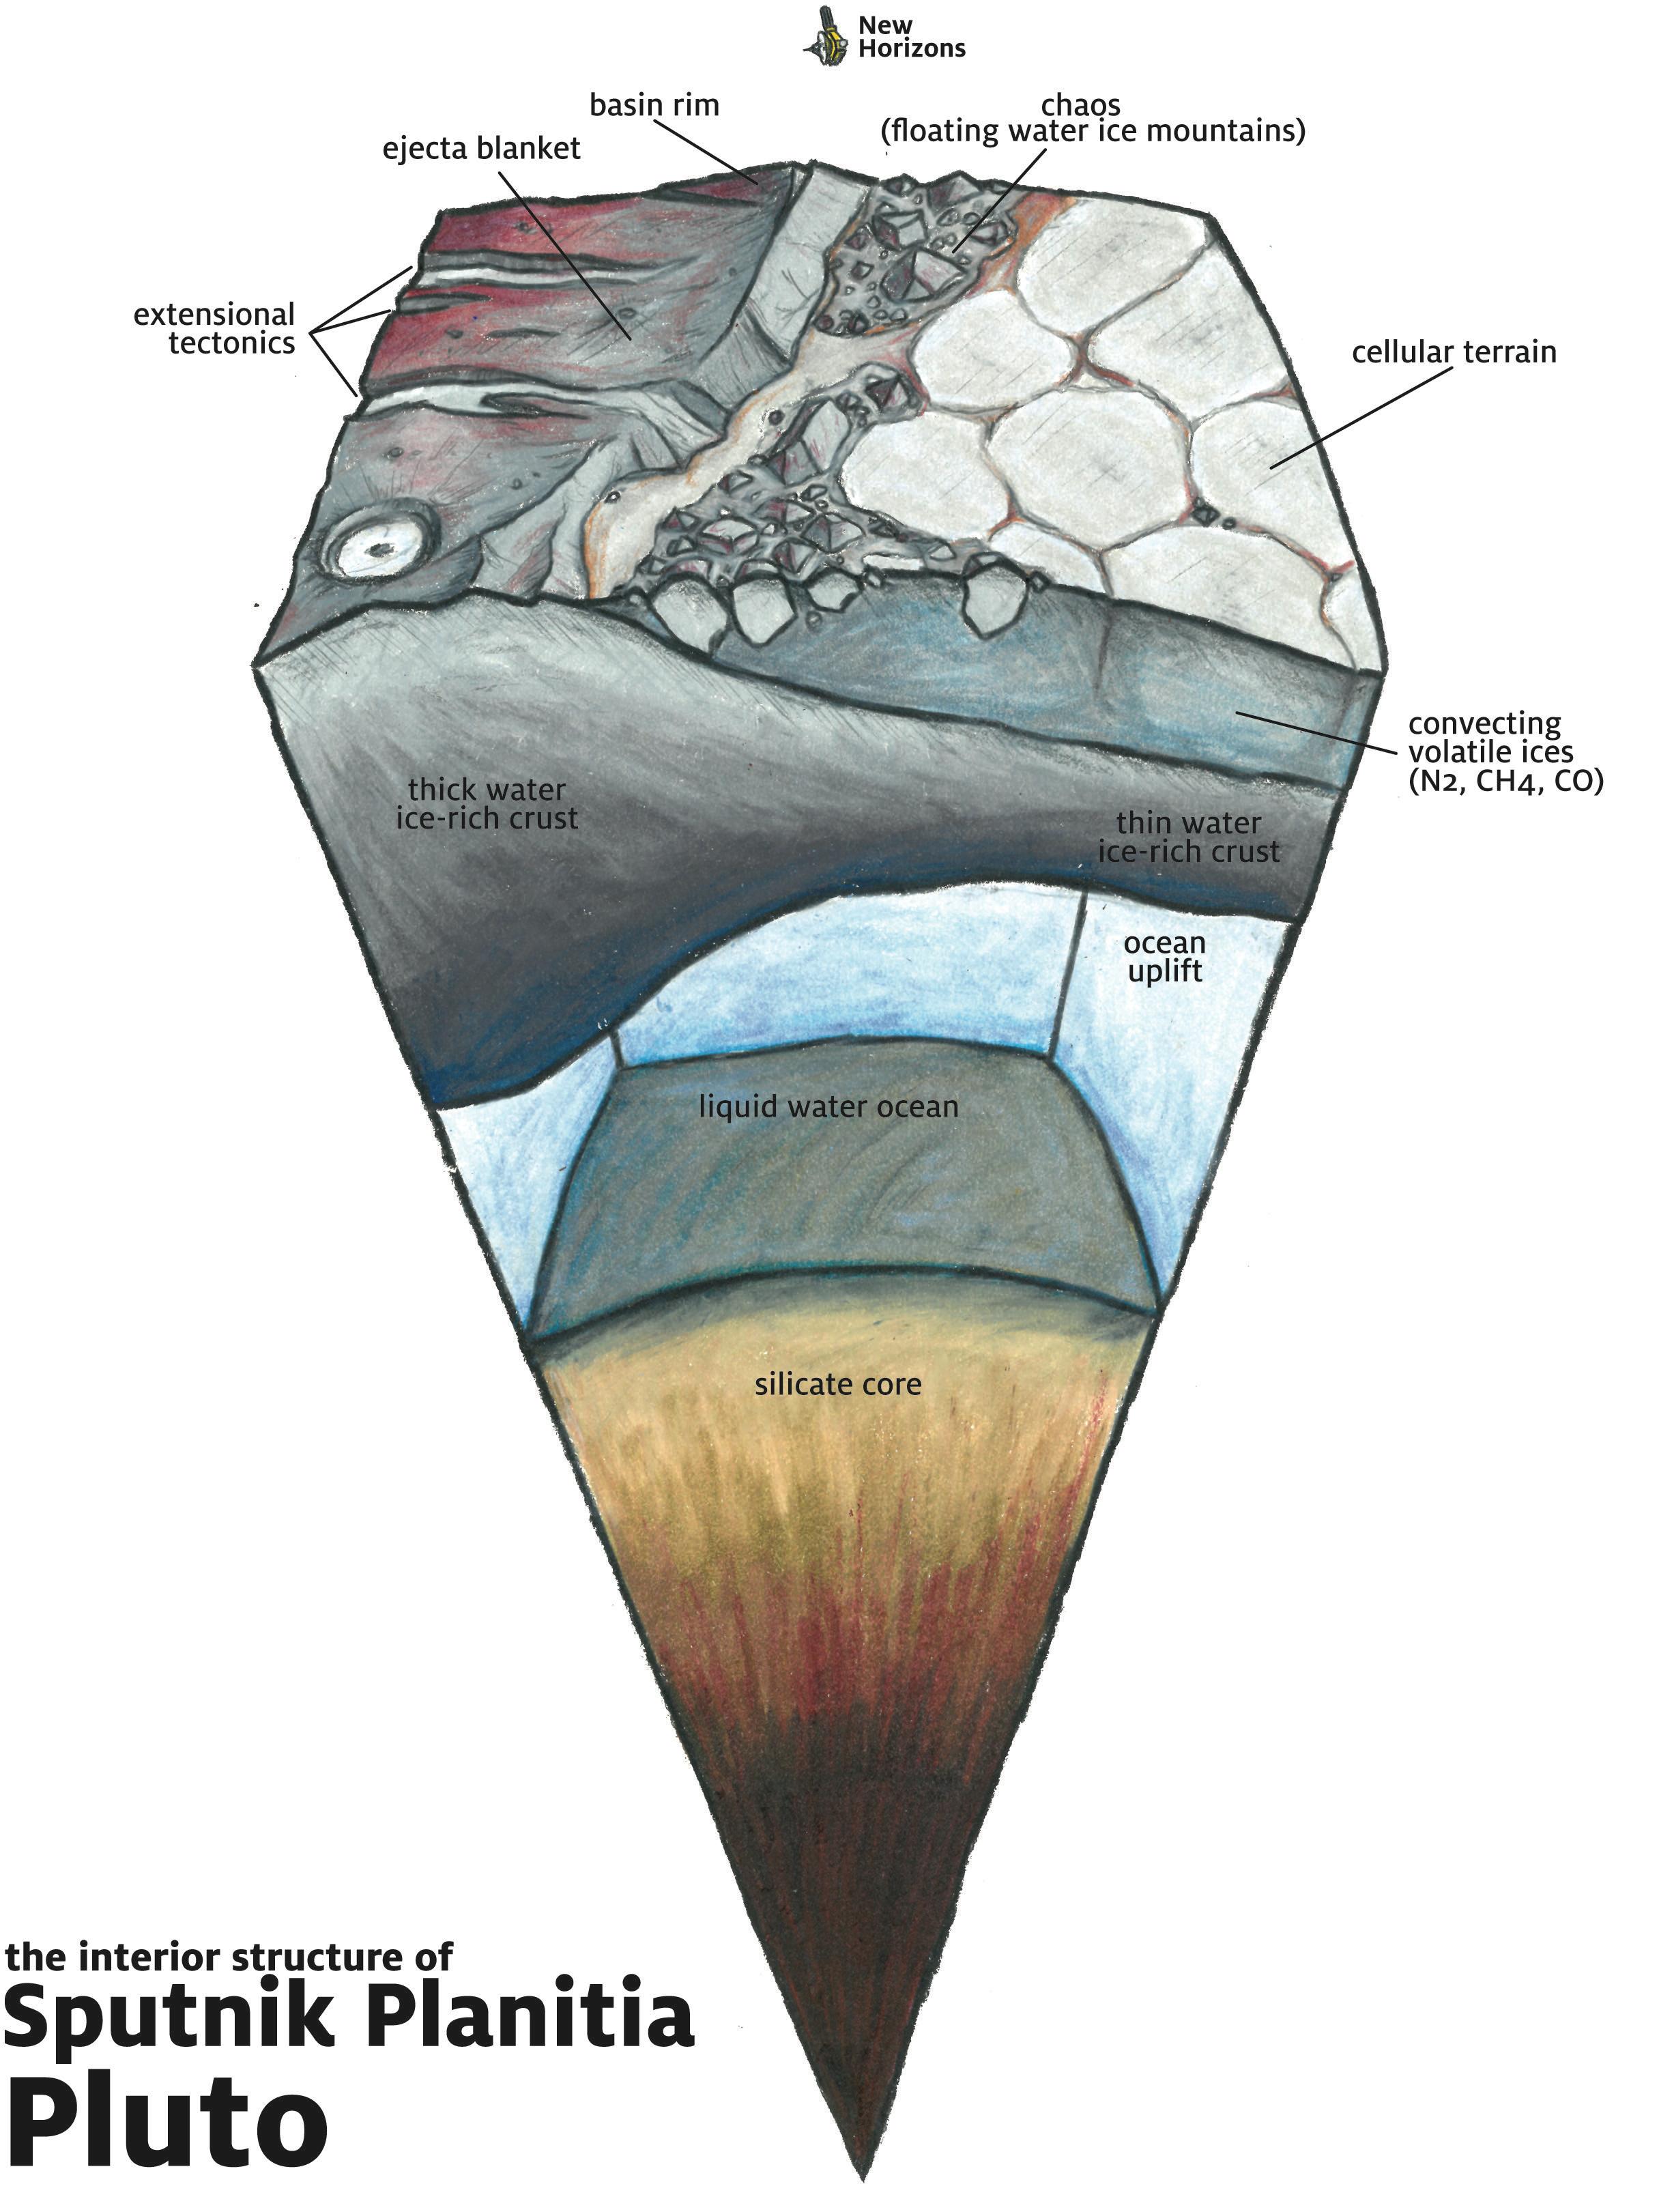 The Interior Structure of Pluto